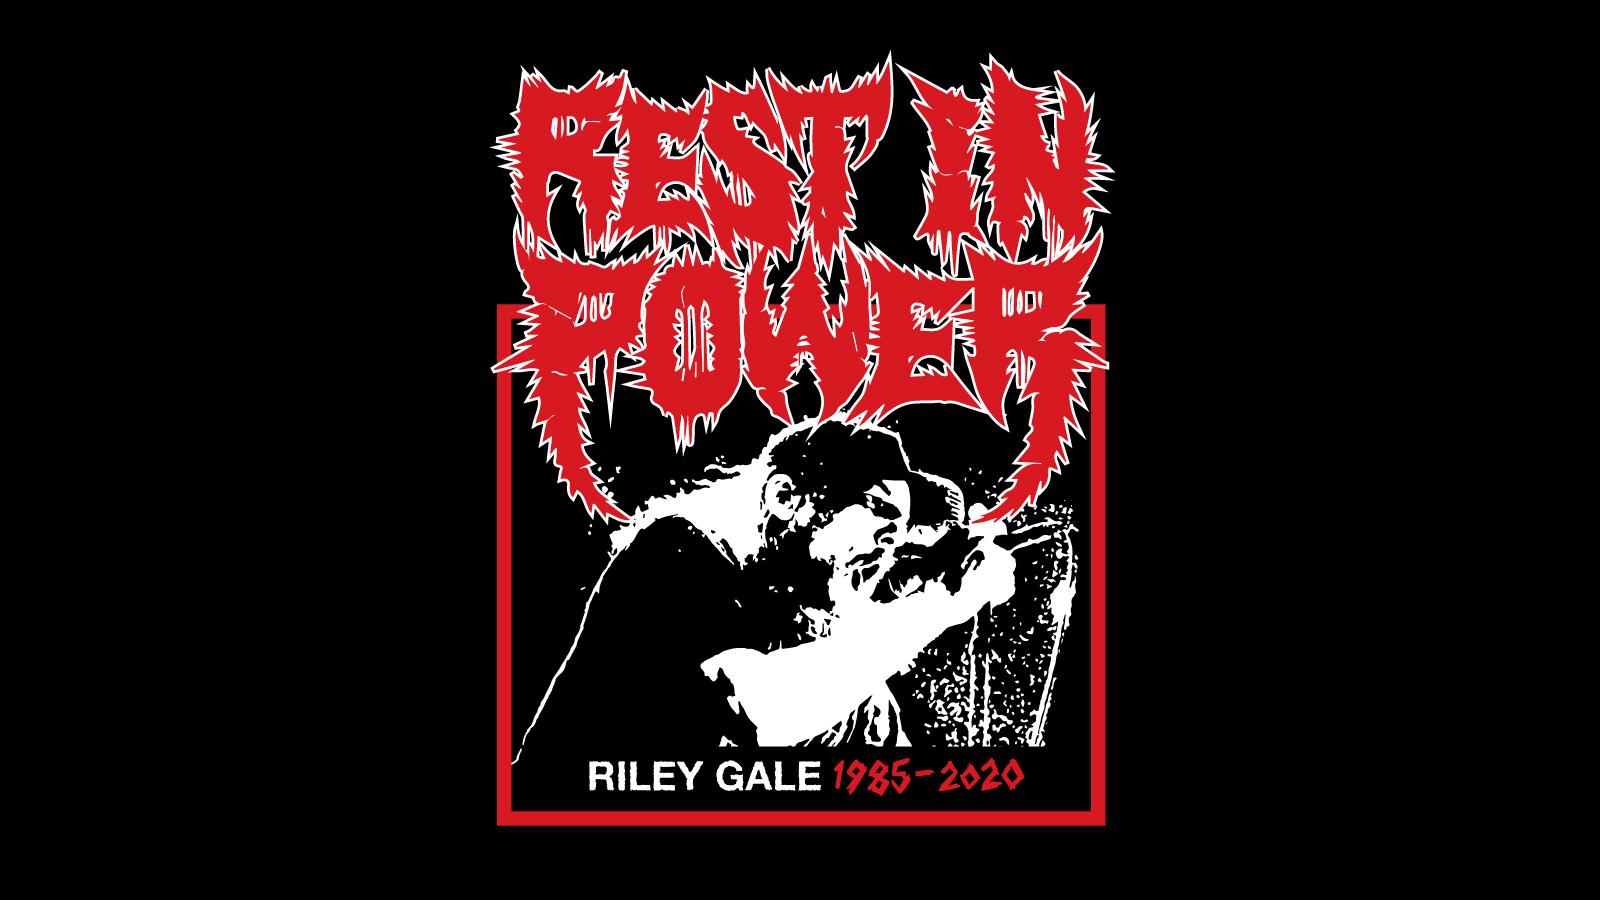 Riley Gale